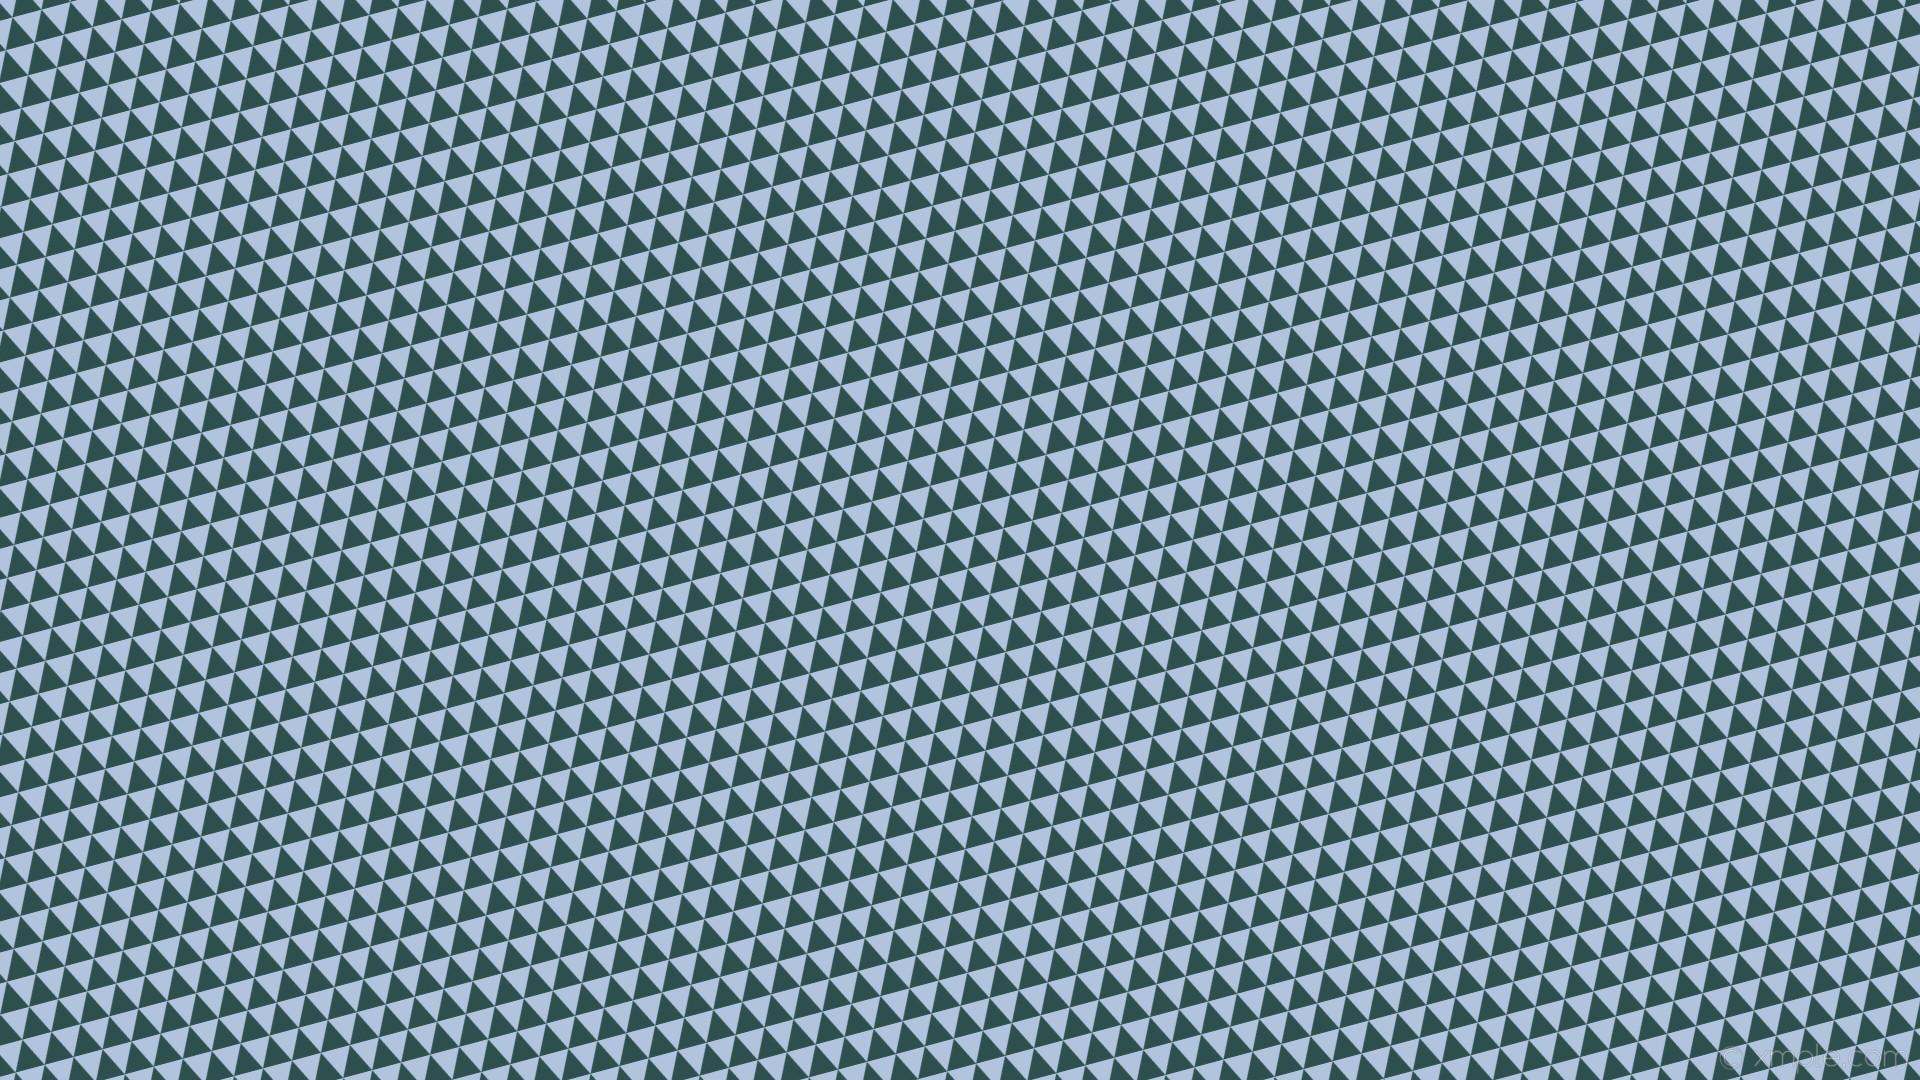 wallpaper triangle grey blue light steel blue dark slate gray #b0c4de  #2f4f4f 15°